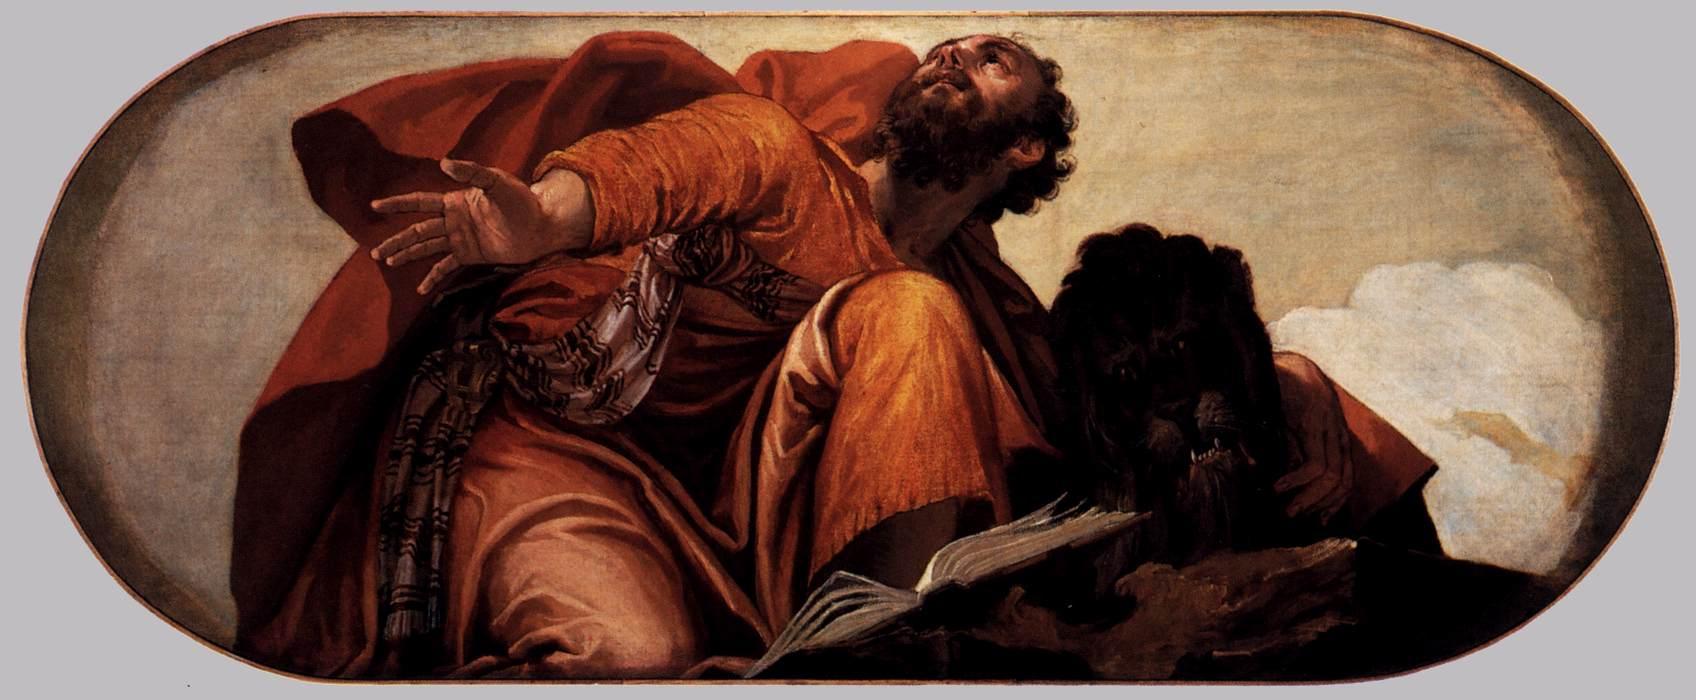 Paolo Veronese - St Mark - WGA24798.jpg